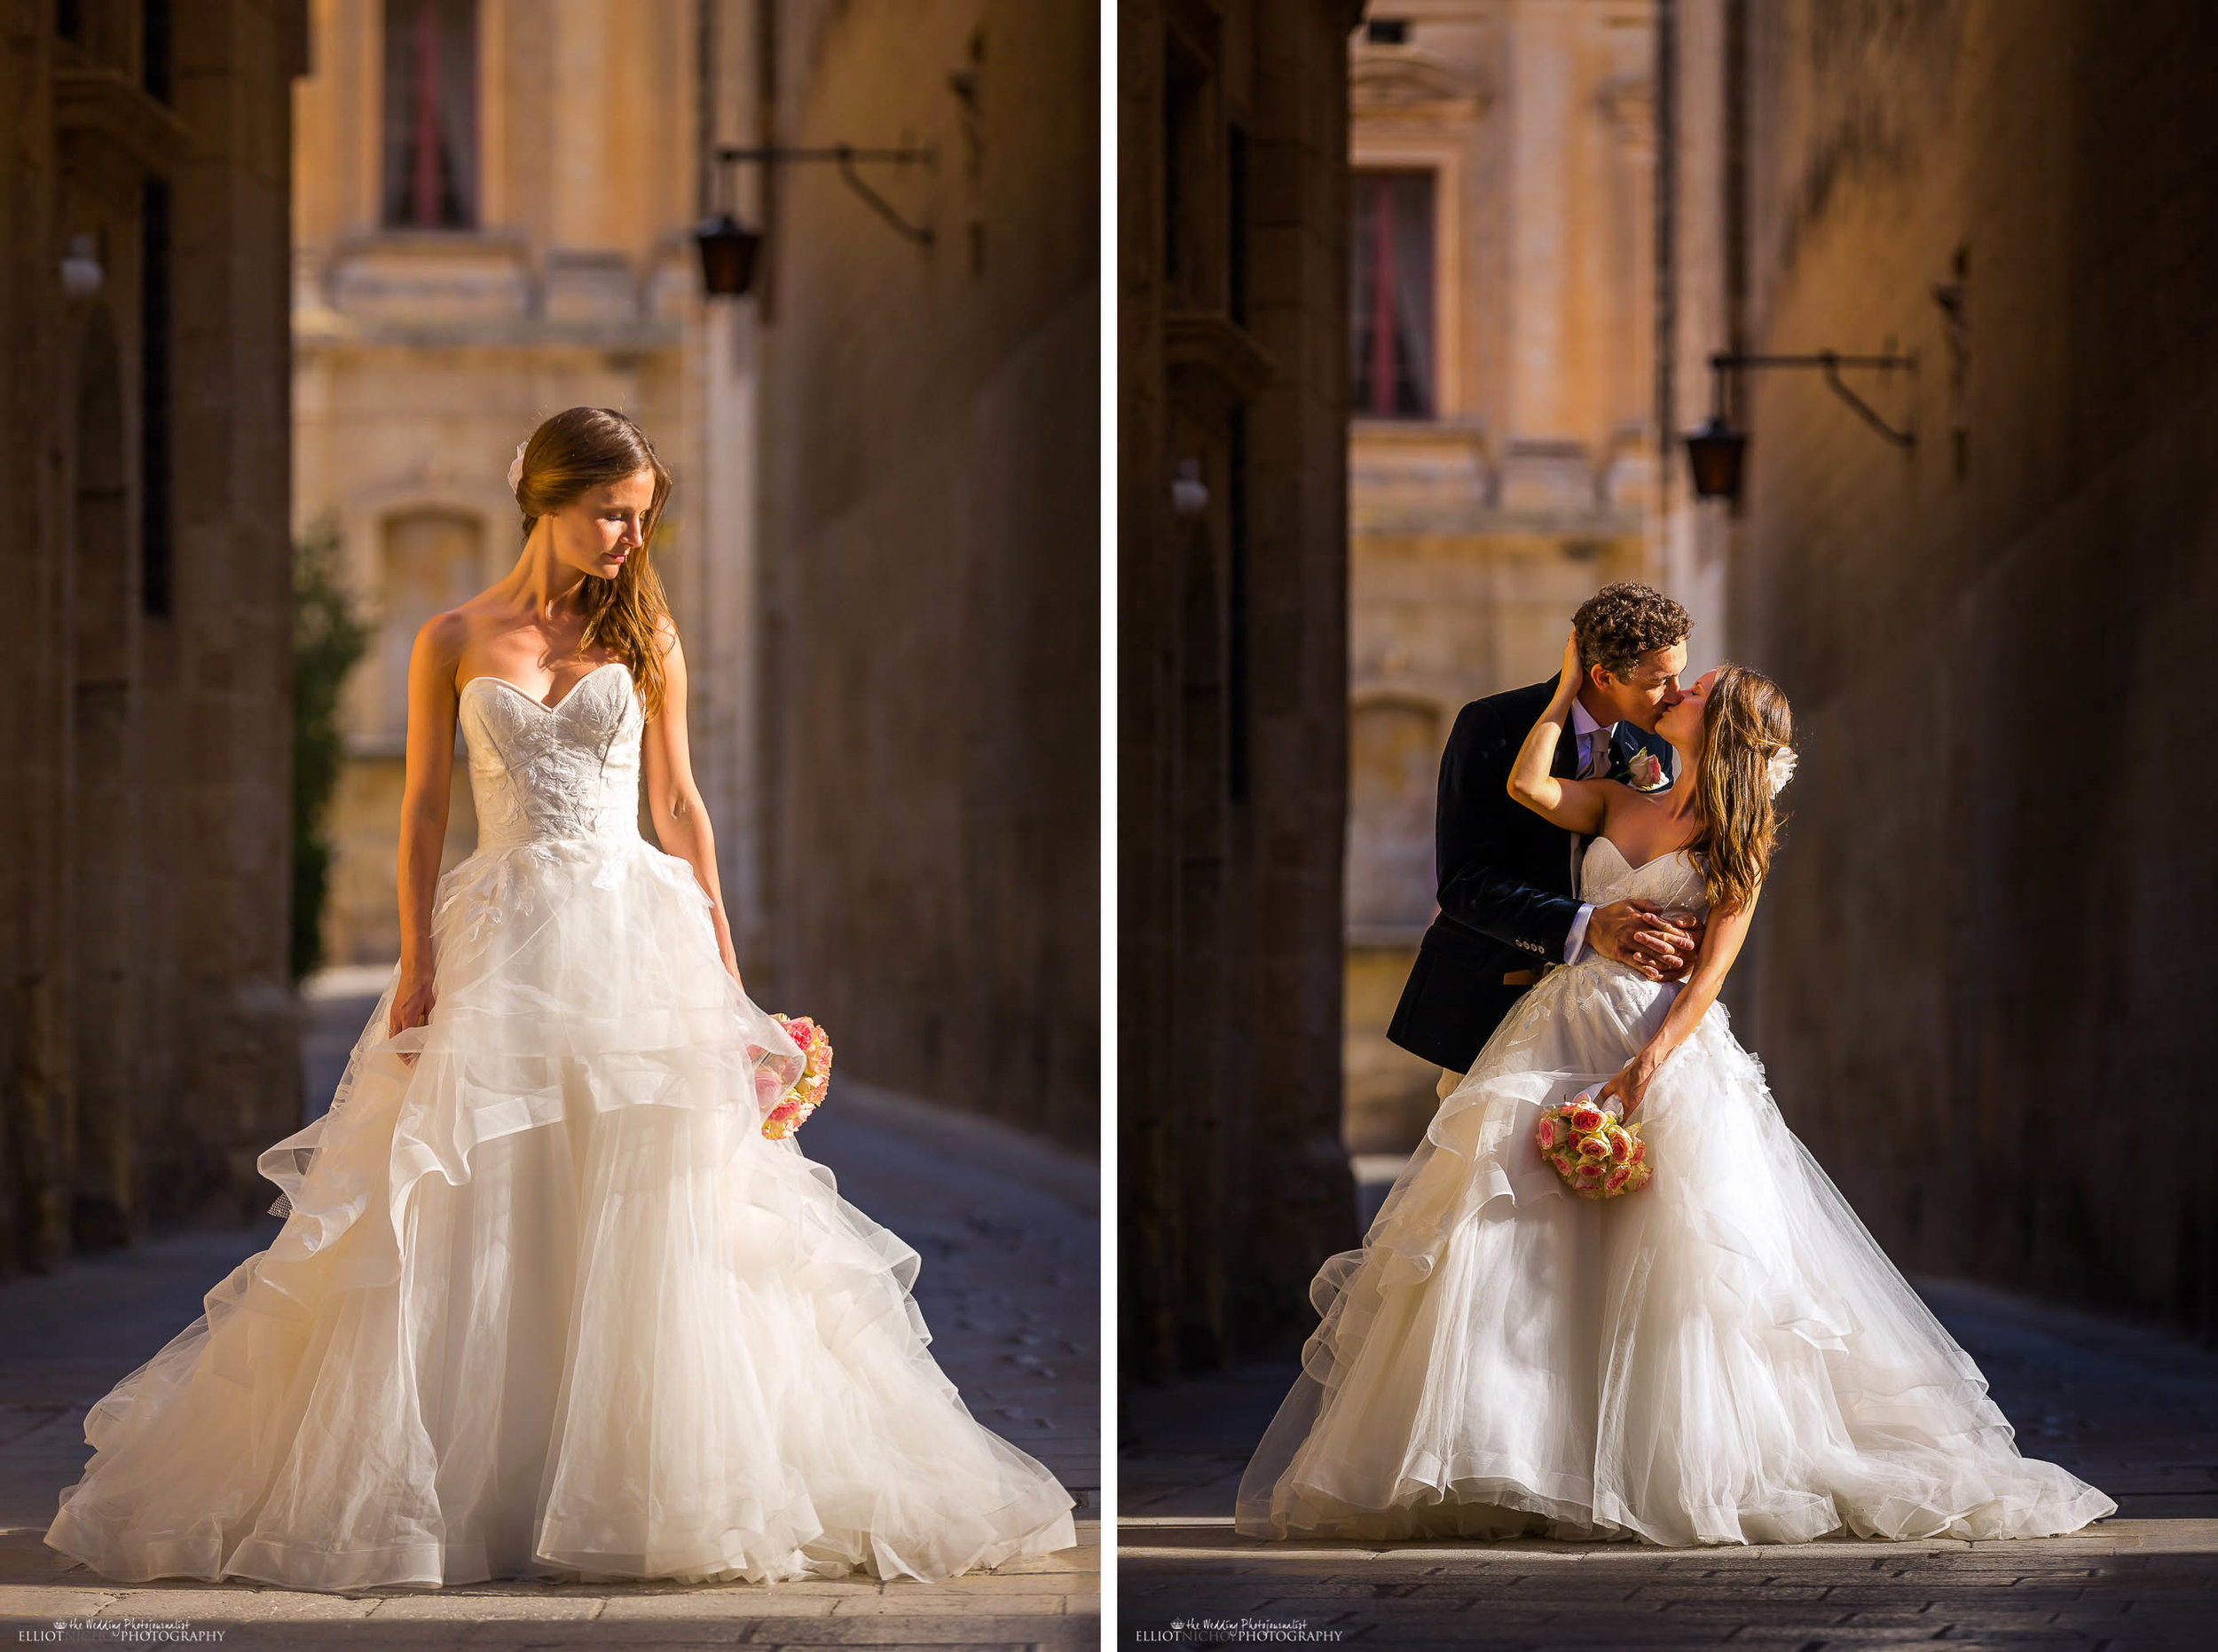 bride-wedding-dress-groom-photography-portrait-Northeast-photographer